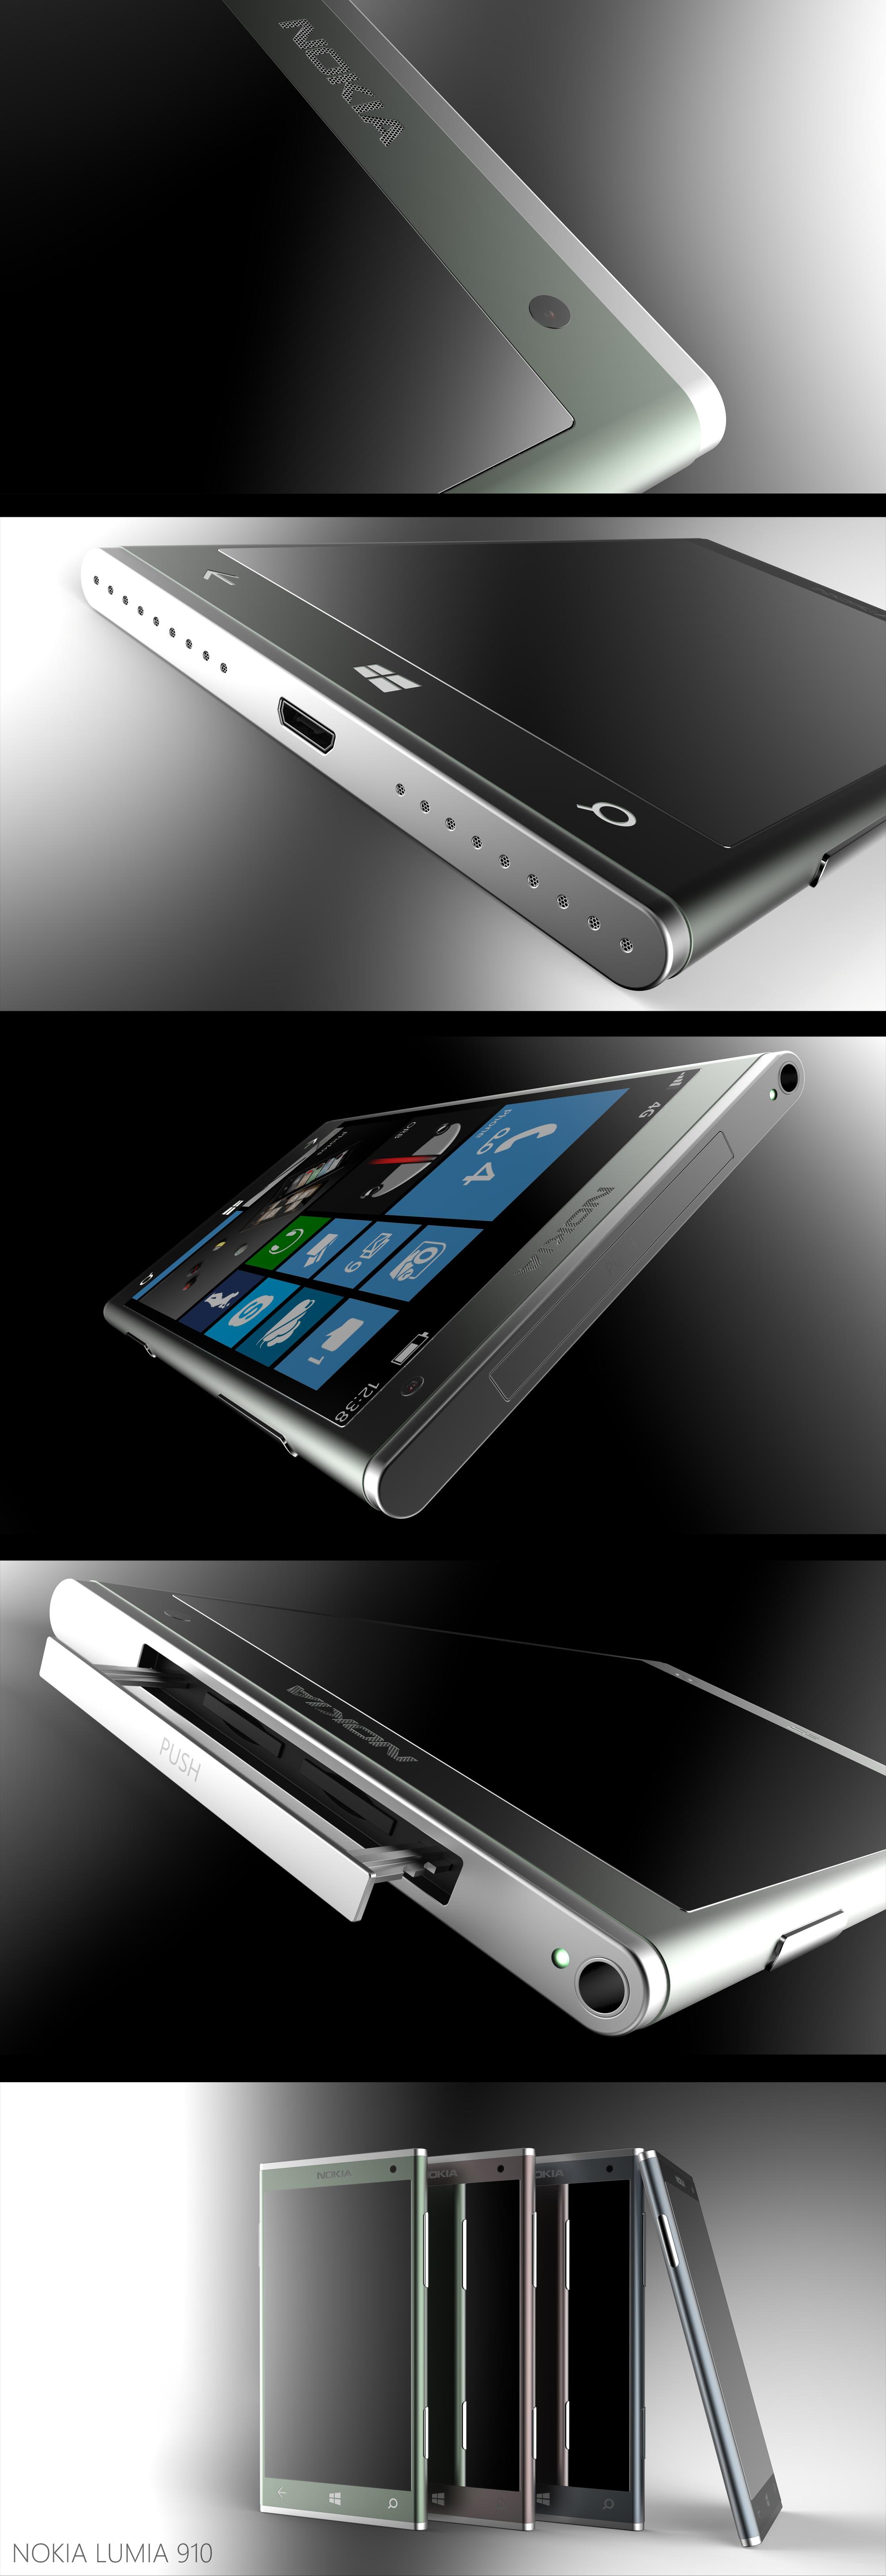 Nokia Lumia 910 Teaser (2) by Jonas-Daehnert